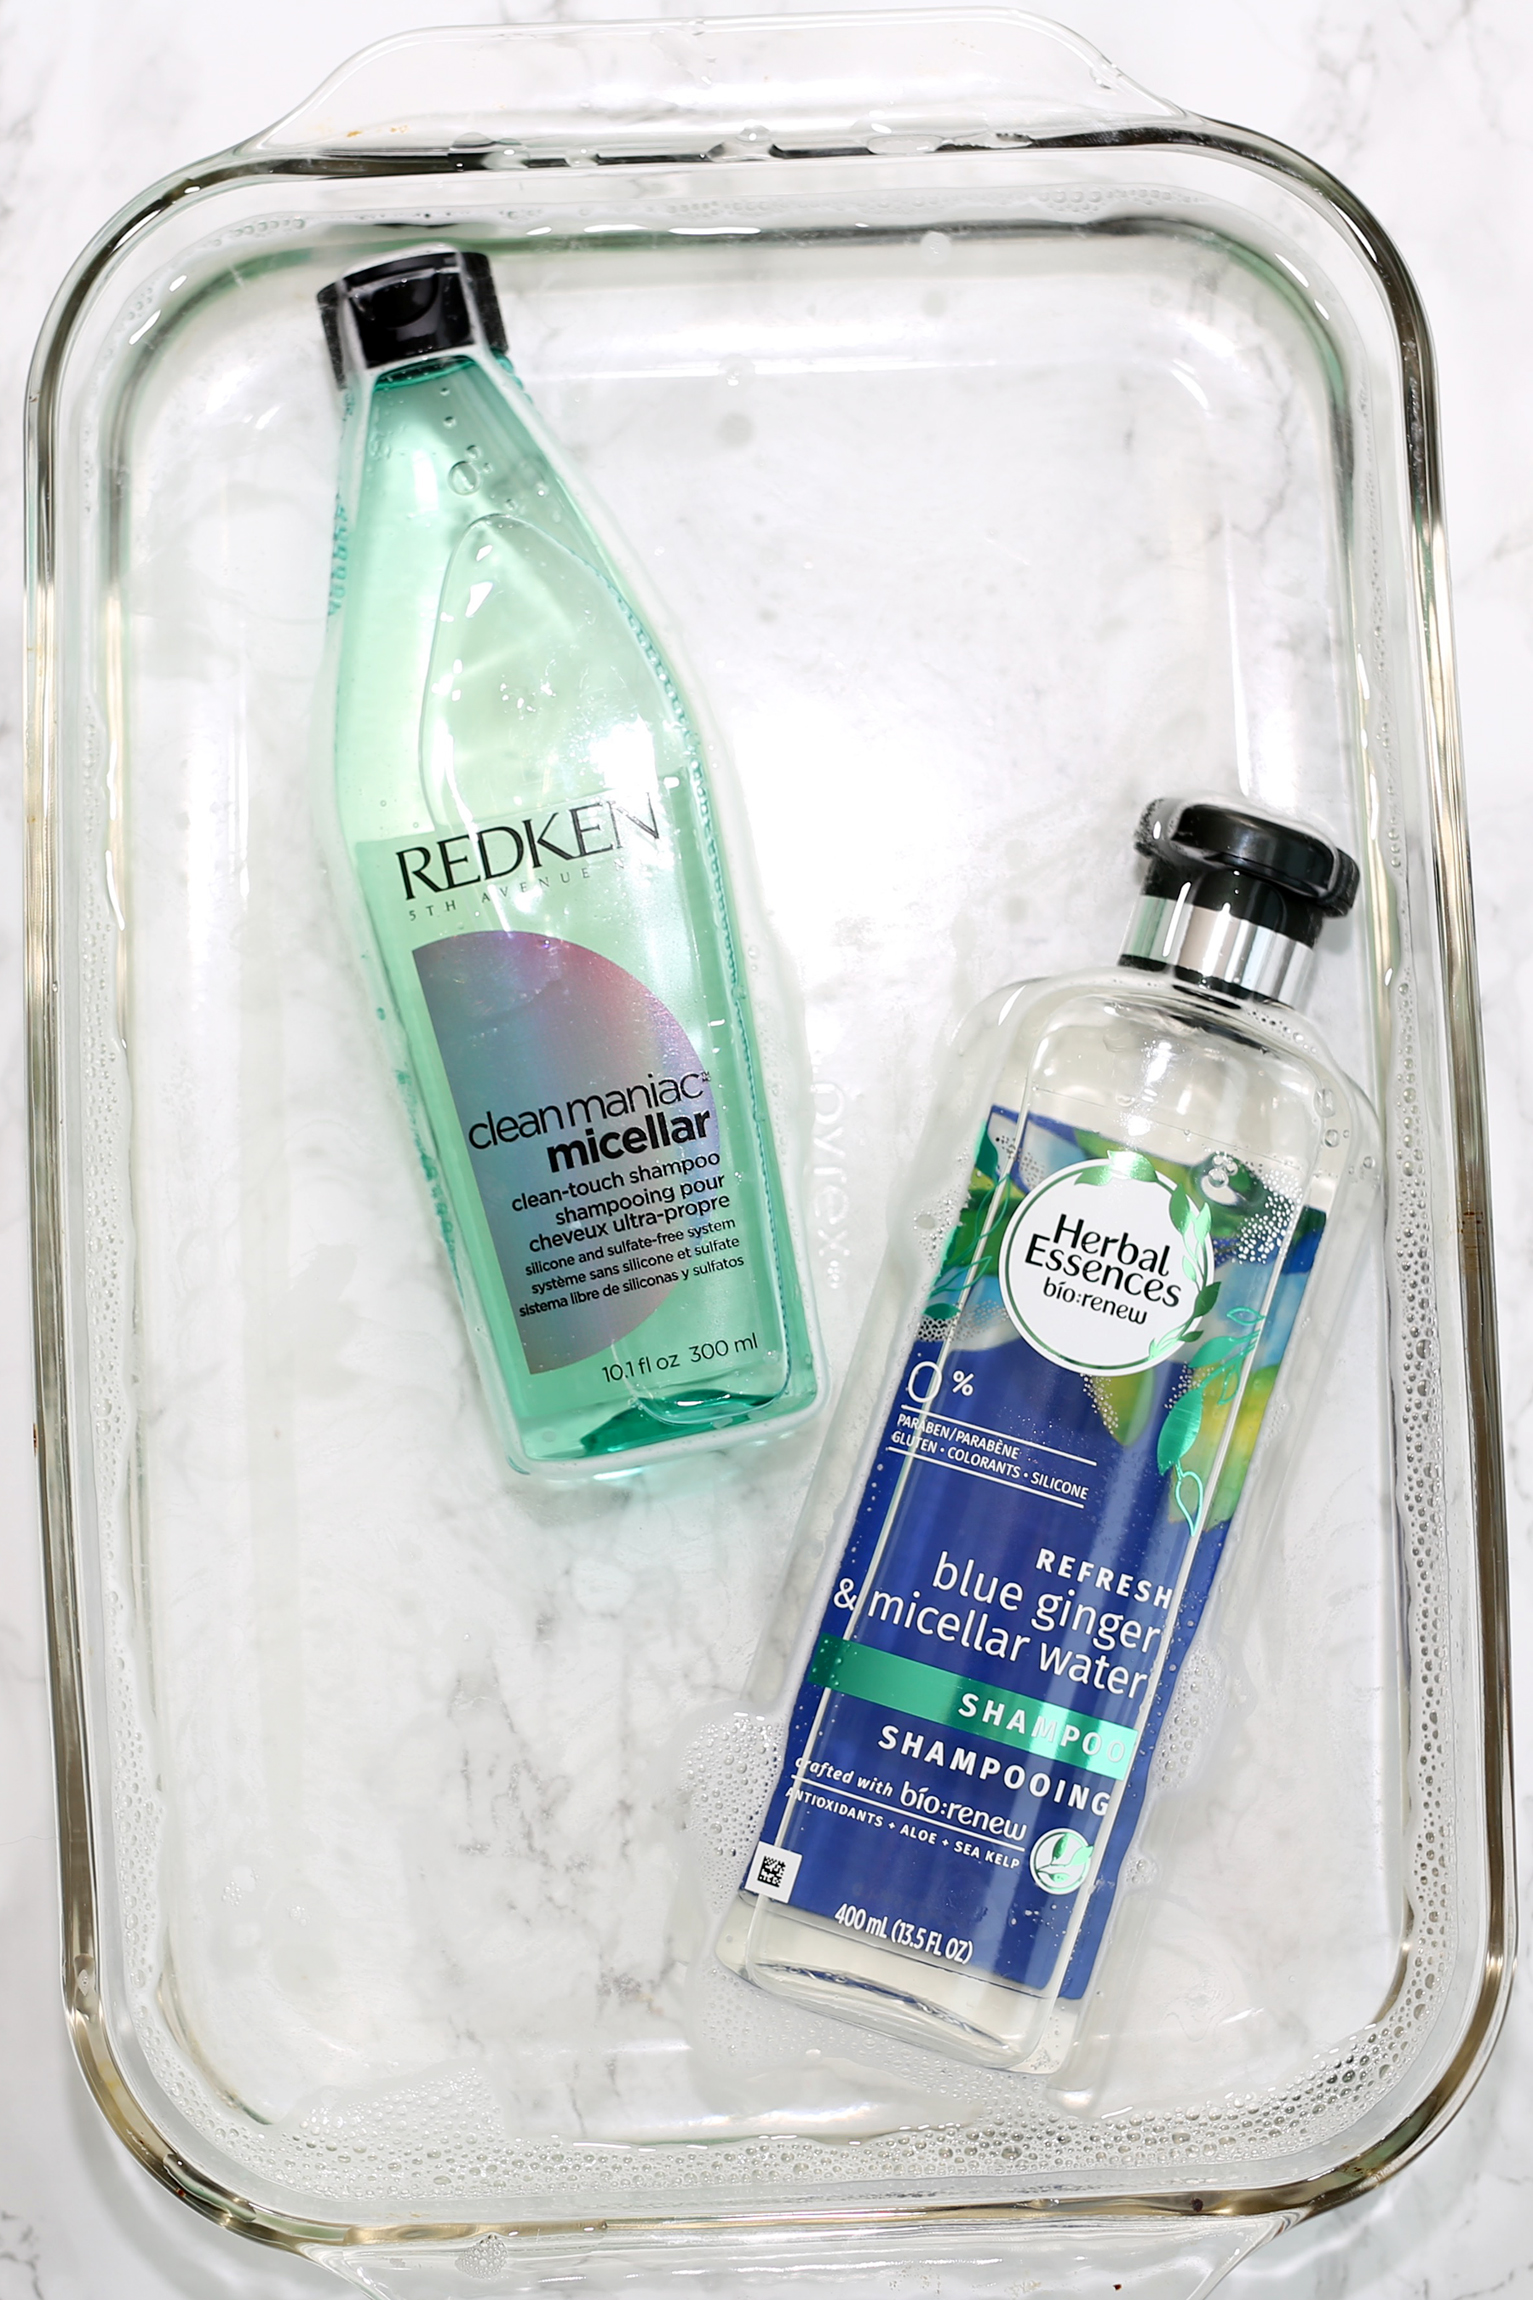 Micellar Shampoo Is The Next Big Thing For Hair Care! - Redken Micellar Shampoo and Herbal Essences bio renew Micellar Shampoo and conditioner, Rachel Zipperian, Nathaie Martin, beauty blog woahstyle.com_6159.jpg